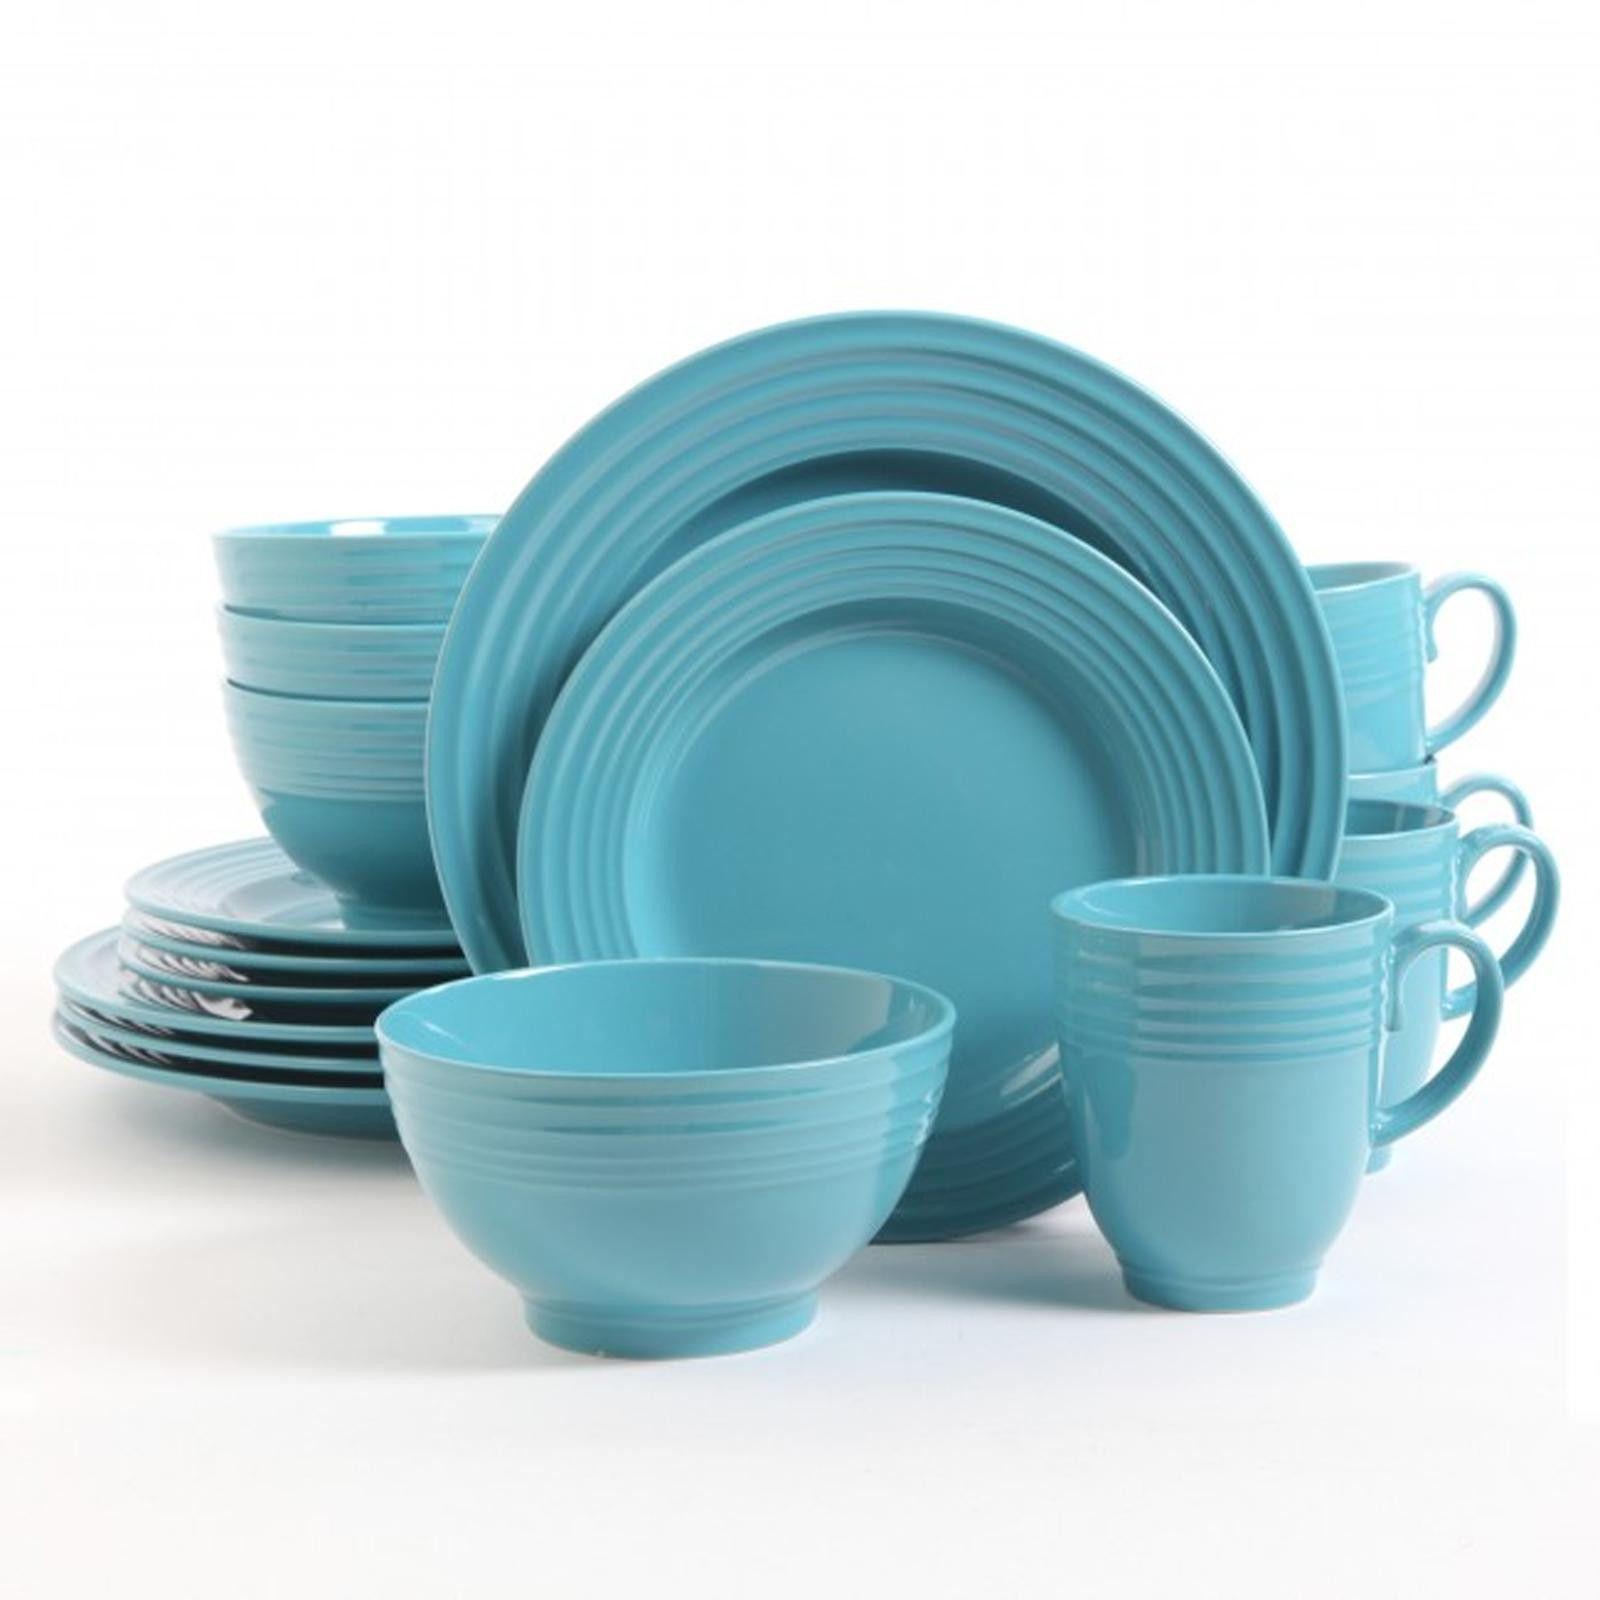 Gibson Stanza 16 pc Stoneware Dinnerware Set- Turquoise  sc 1 st  Pinterest & Gibson Stanza 16 pc Stoneware Dinnerware Set- Turquoise | Kitchen ...